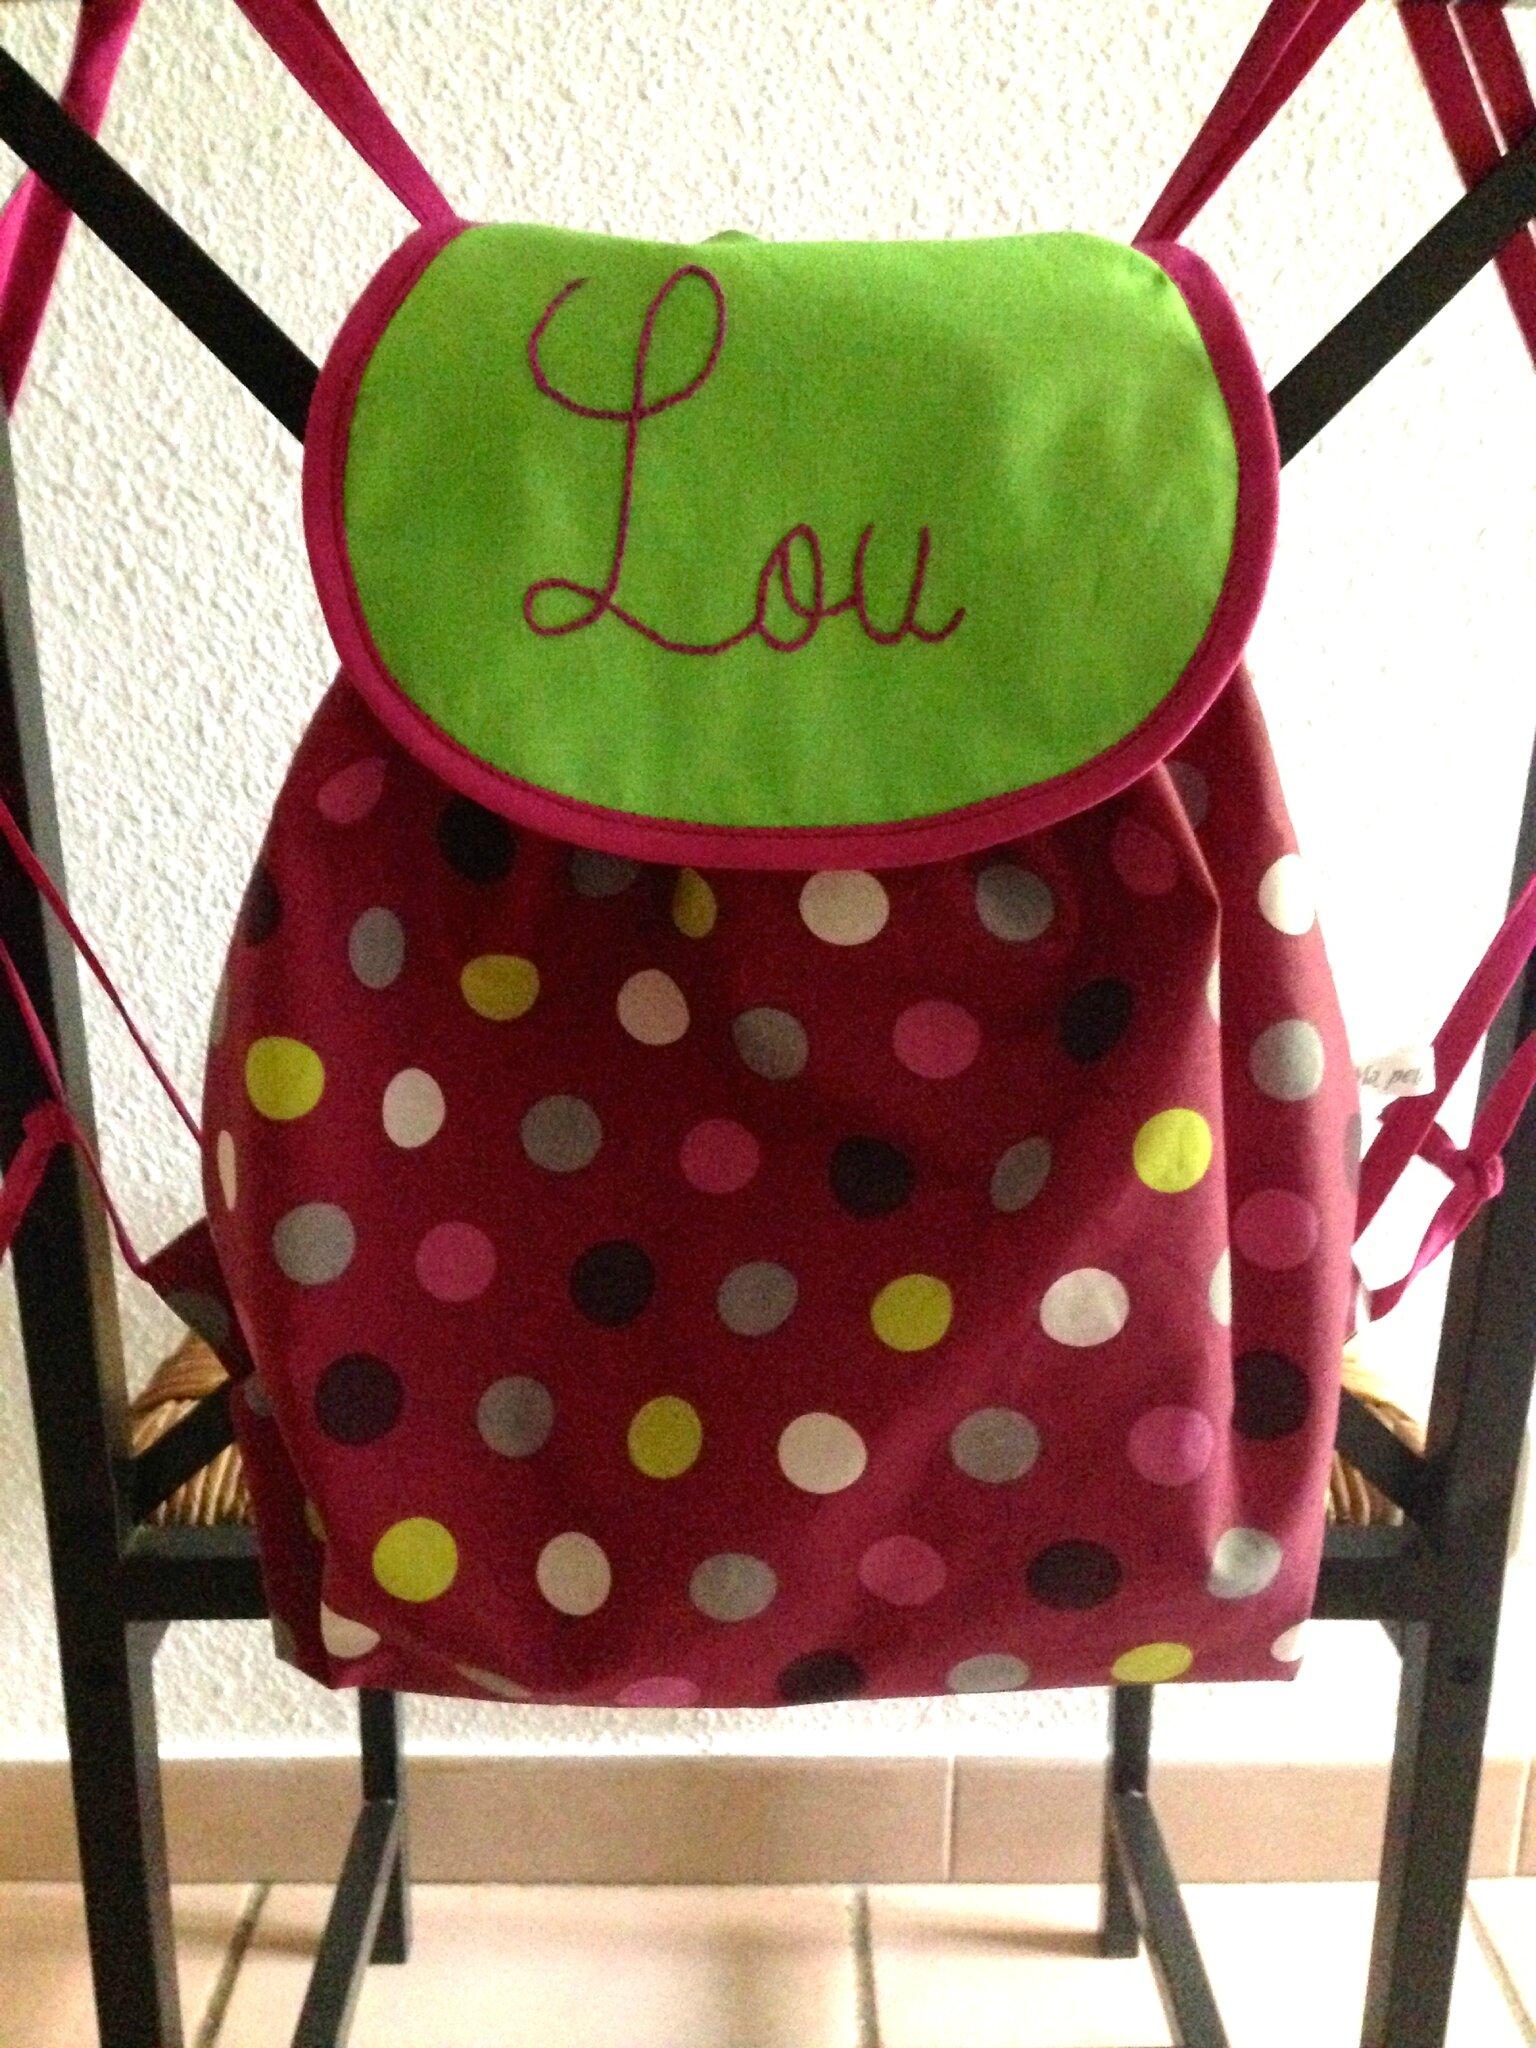 Sac à dos Lou - Lou backpack